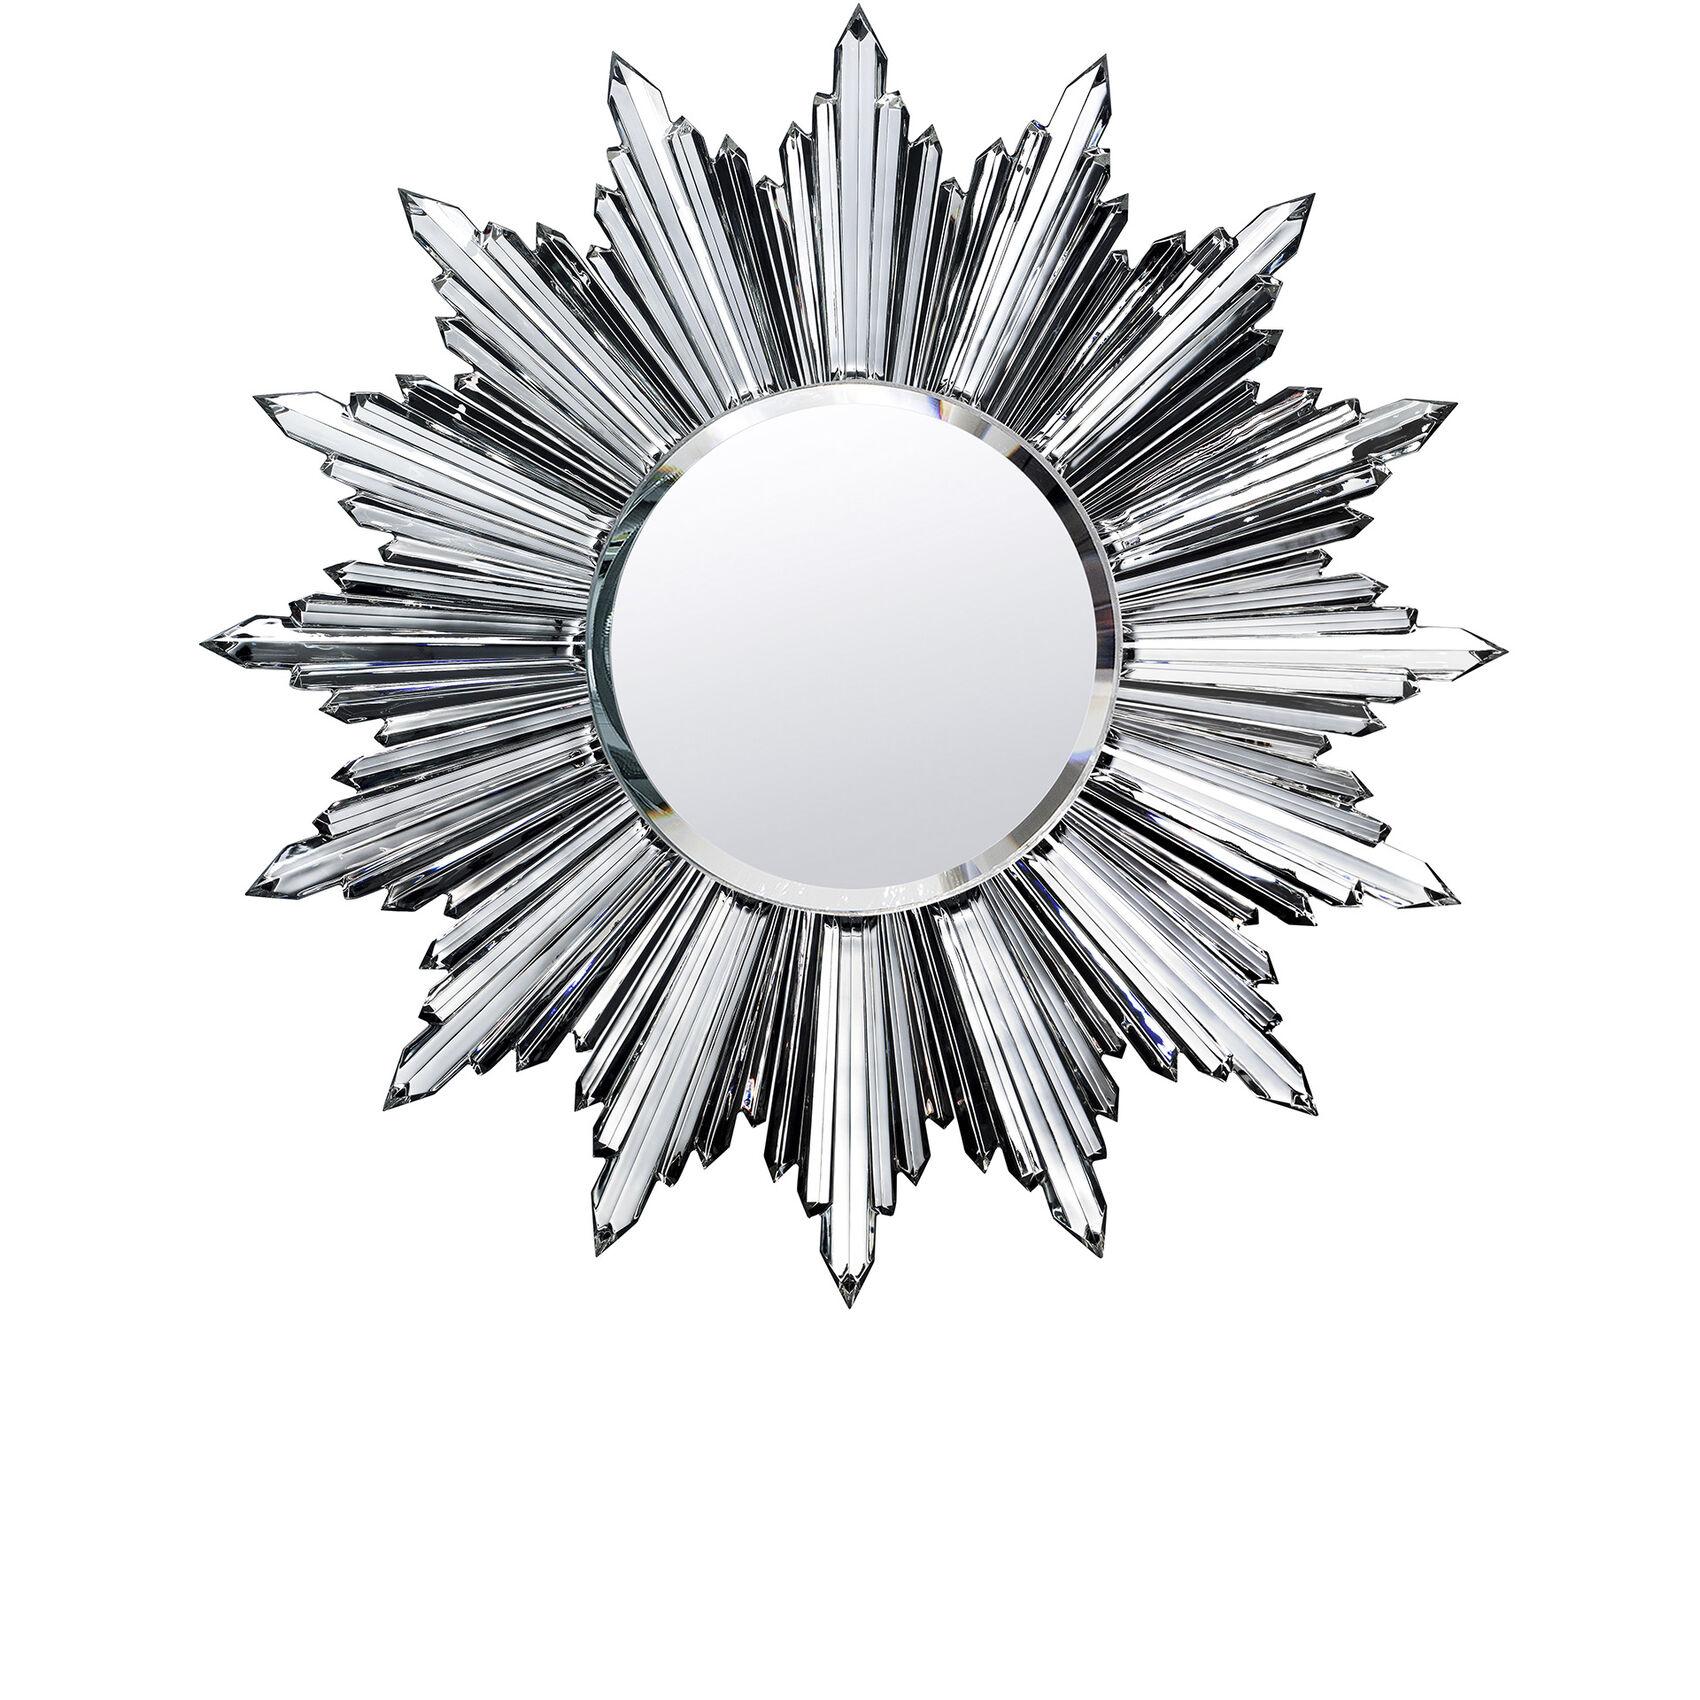 H ritage miroir soleil for Miroir site